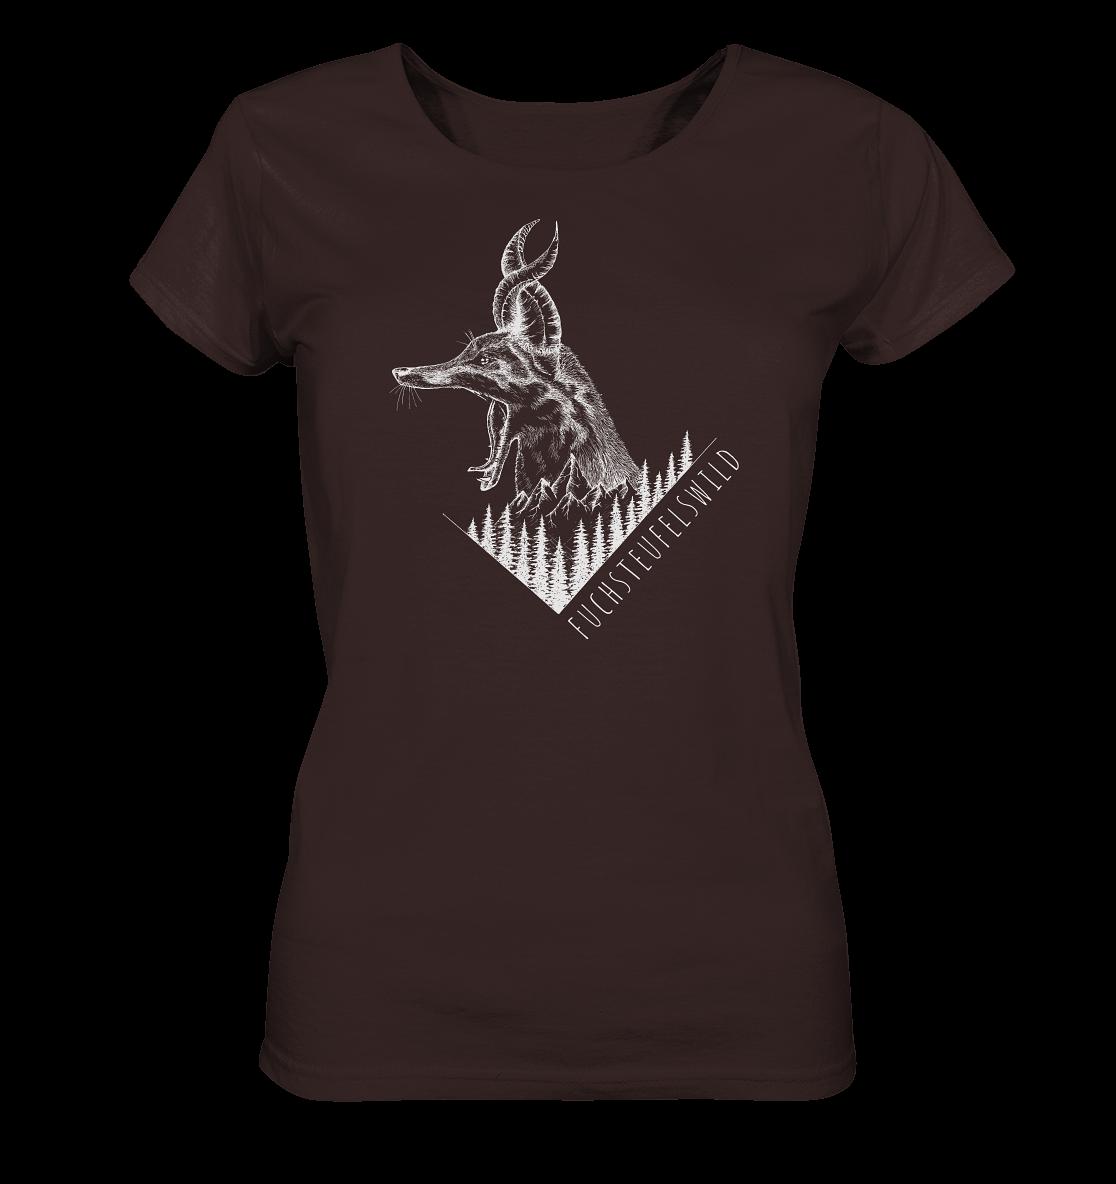 front-ladies-organic-shirt-372726-1116x-3.png